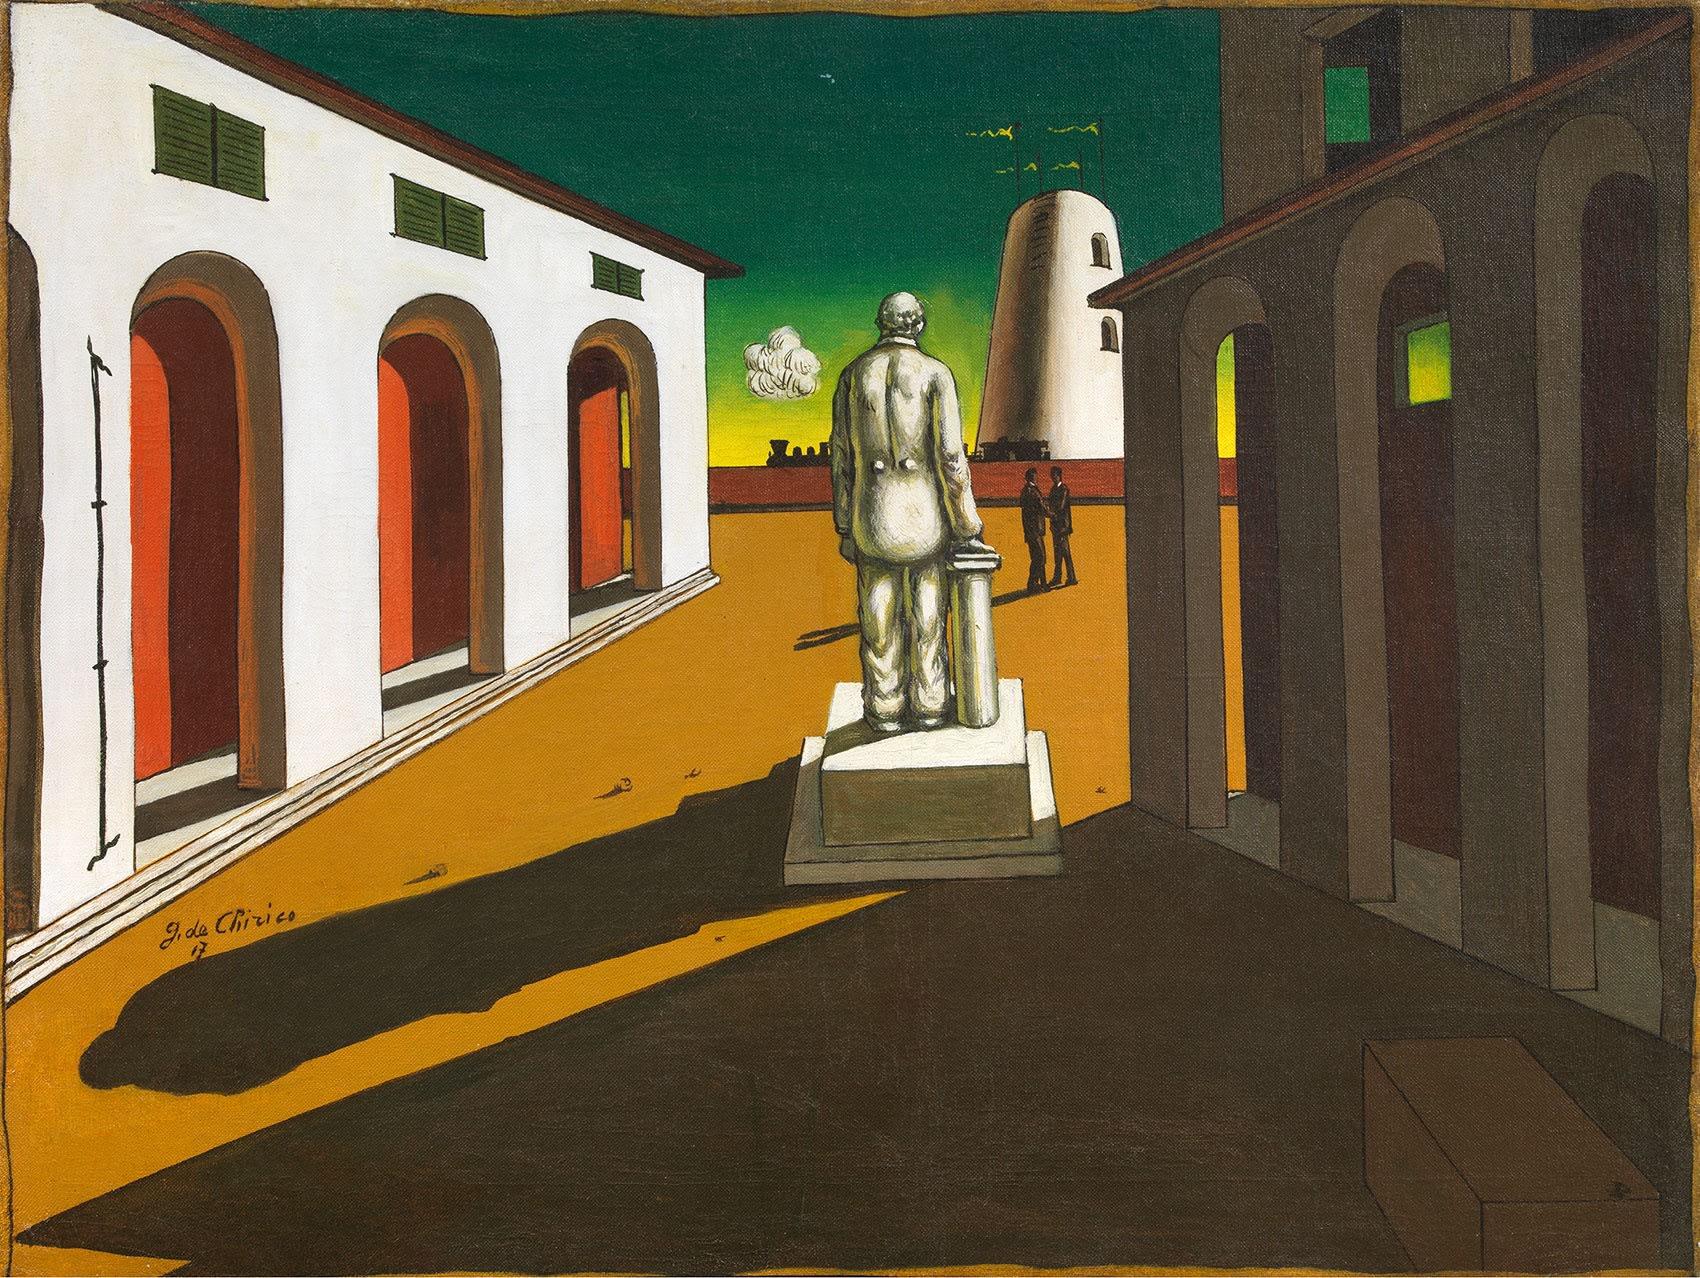 giorgio dechirico, piazza d italia, 1945, tornabuoni art, frieze masters